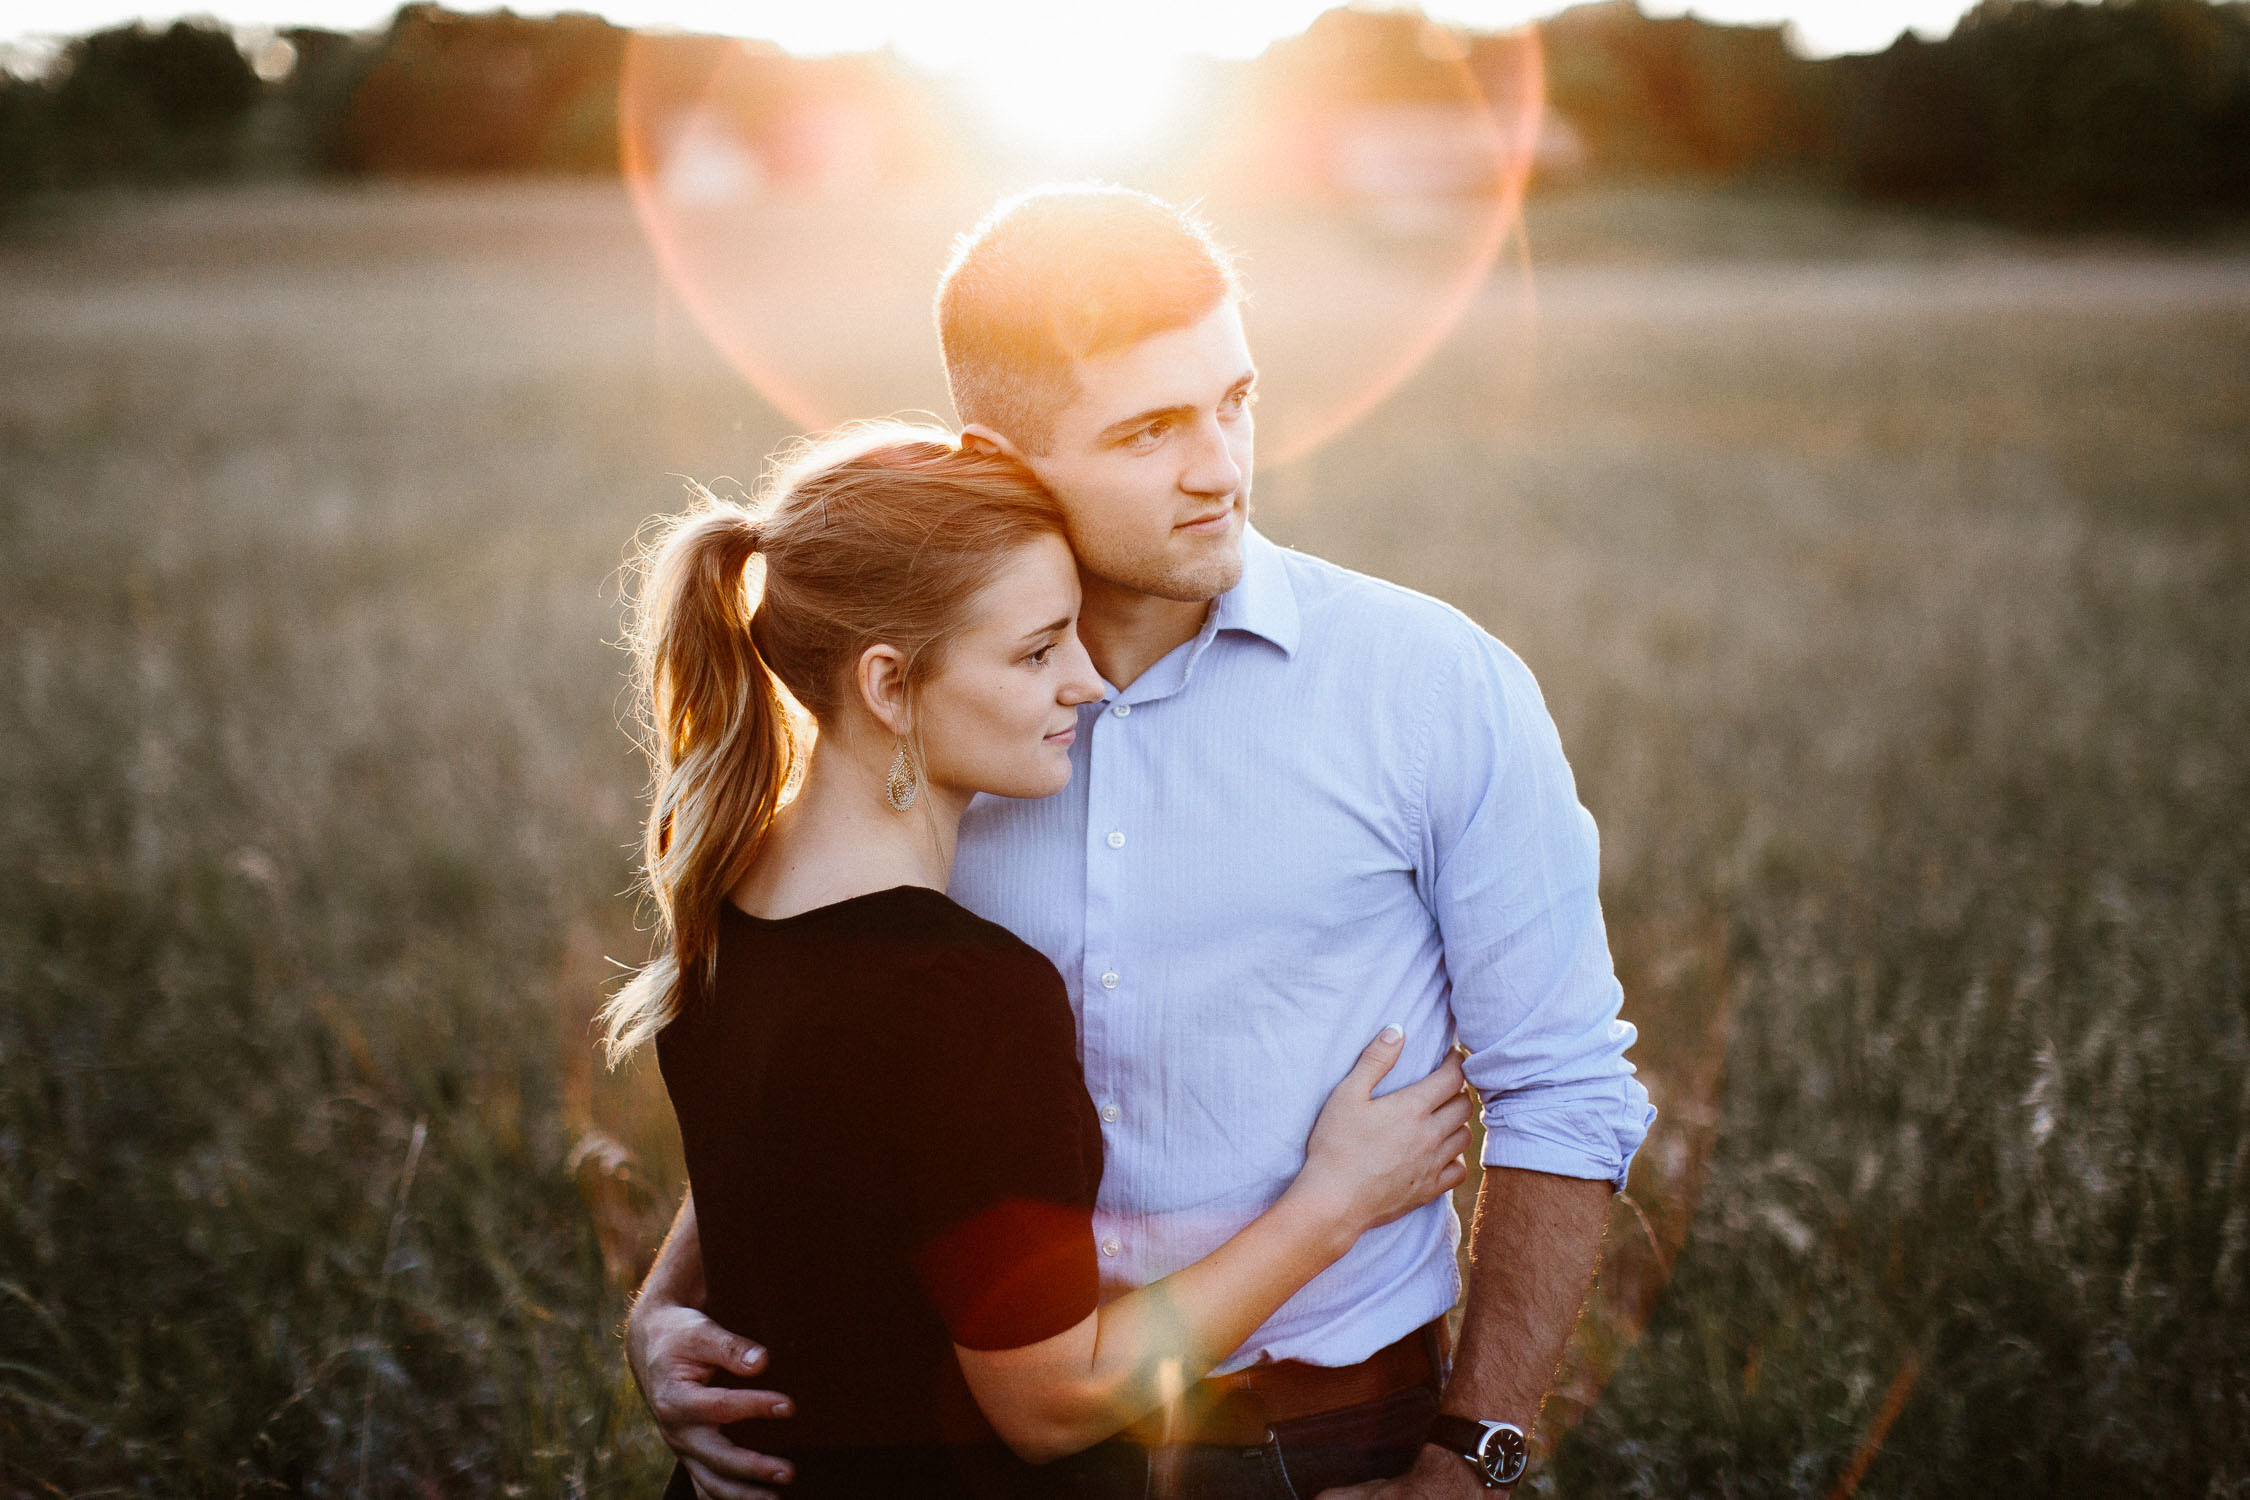 Romantic_Timeless_Downtown_SiouxFalls_Engagement_Wedding_Photographer_59.jpg